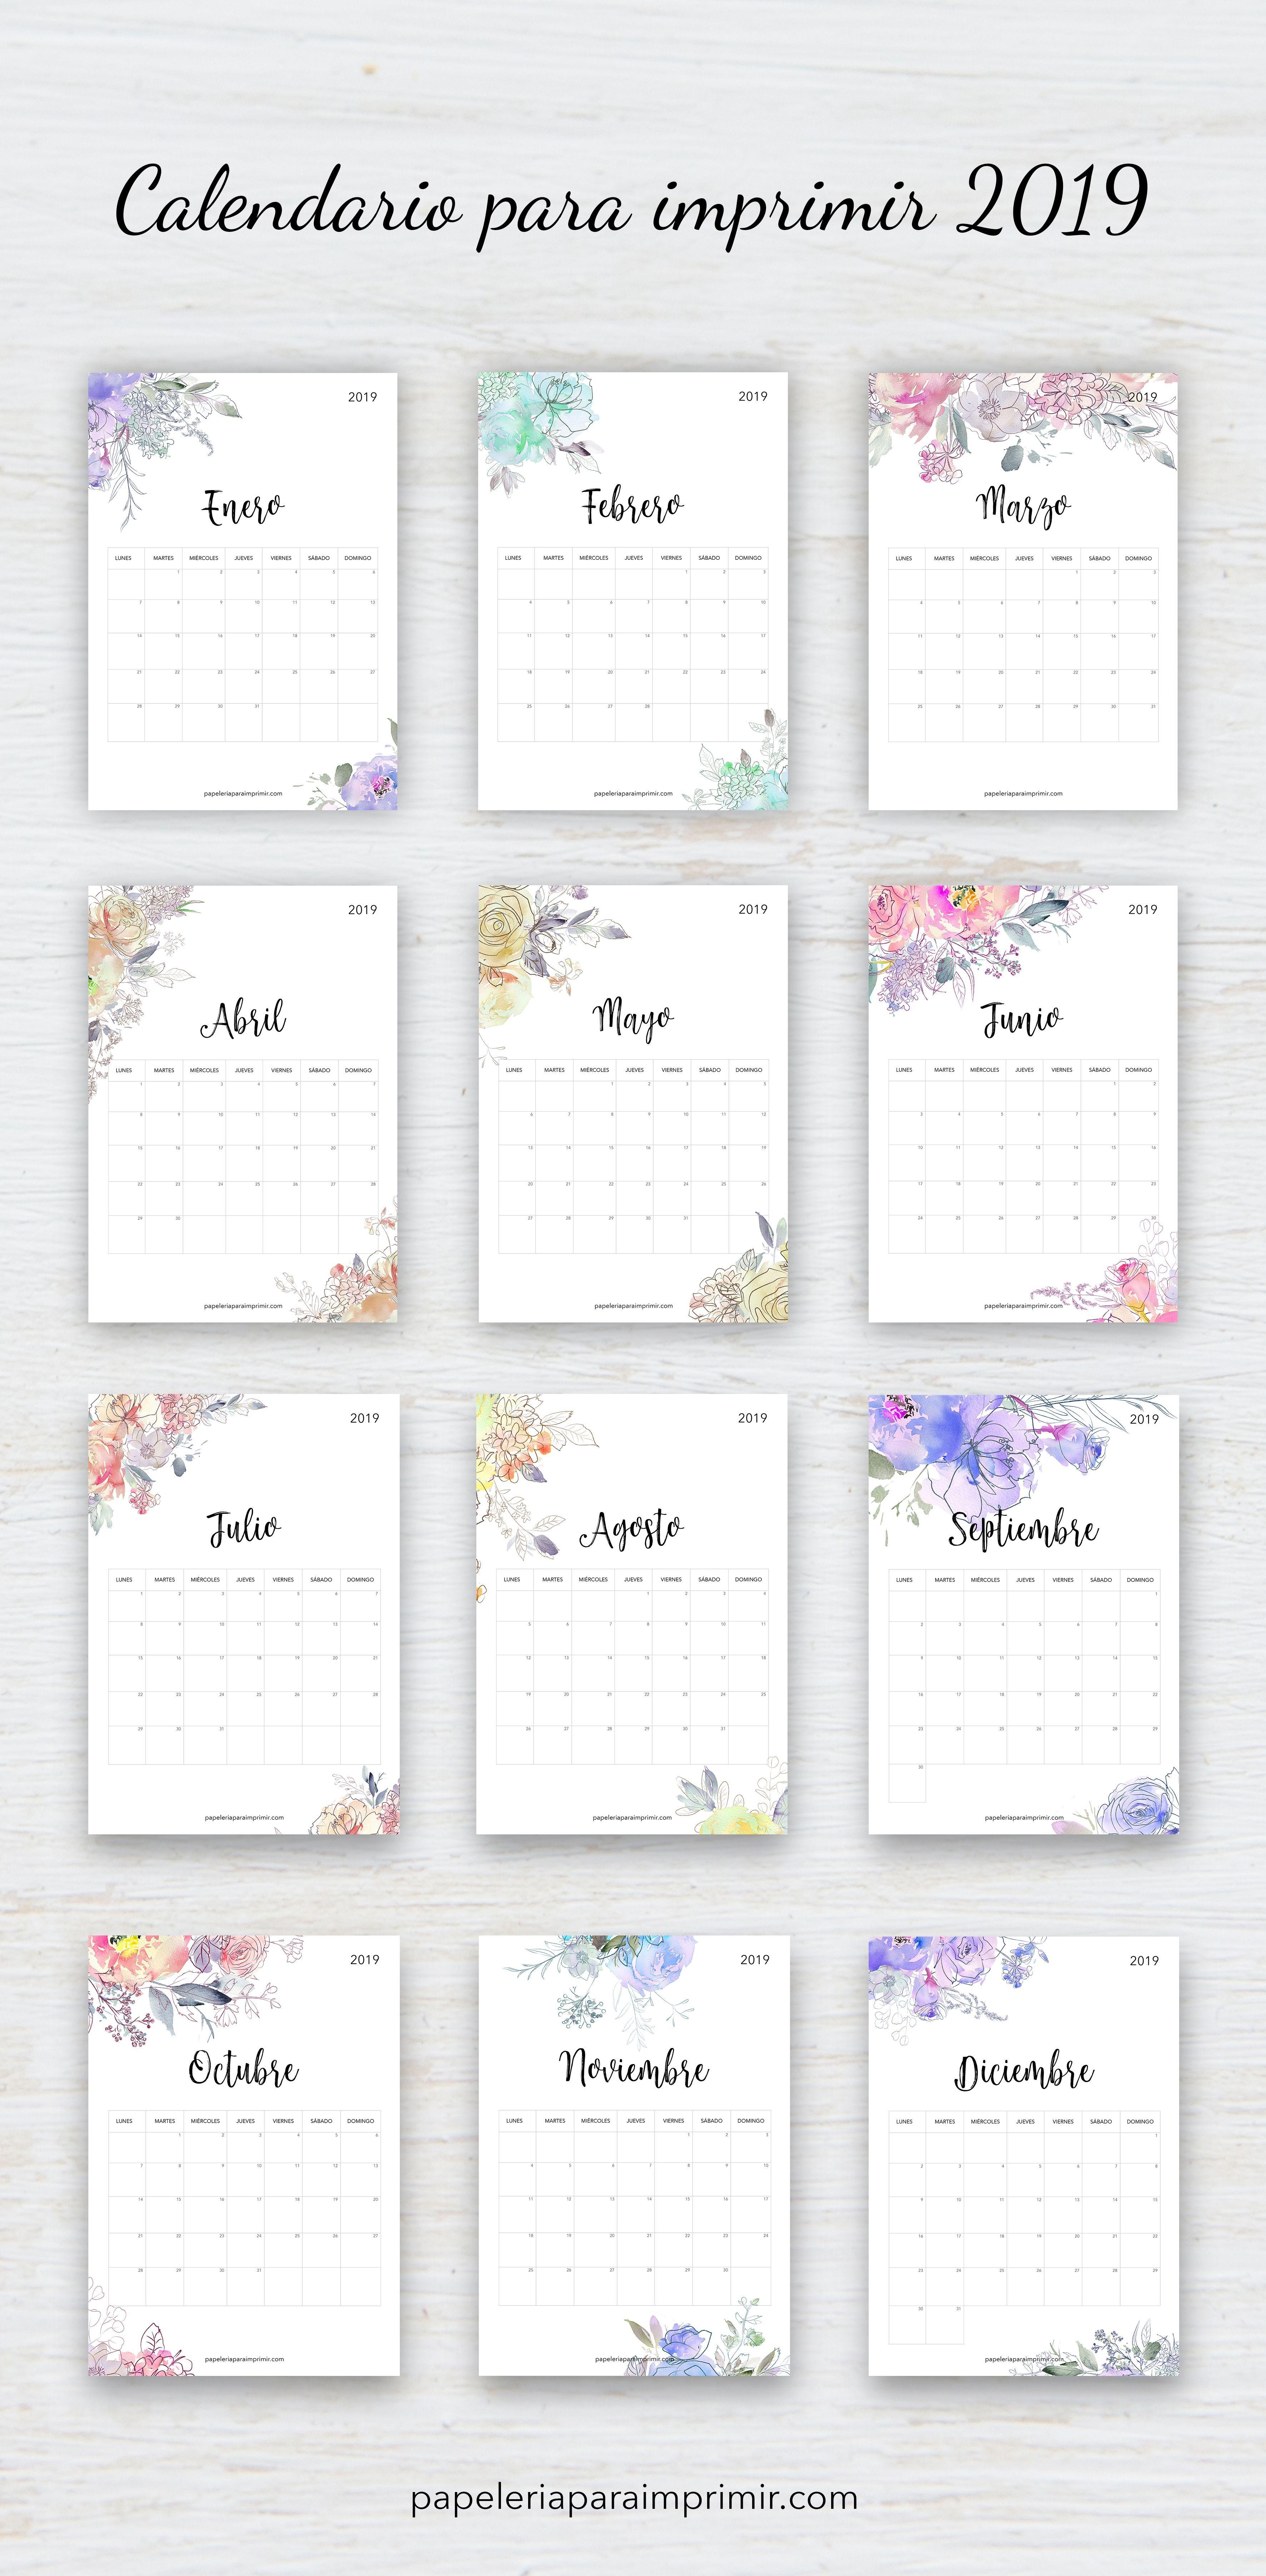 Calendario 2019 Mes Agosto Mejores Y Más Novedosos Papeleria Para Imprimir Papeleriaparaimprimir En Pinterest Of Calendario 2019 Mes Agosto Recientes Boe Documento Boe A 2016 5551